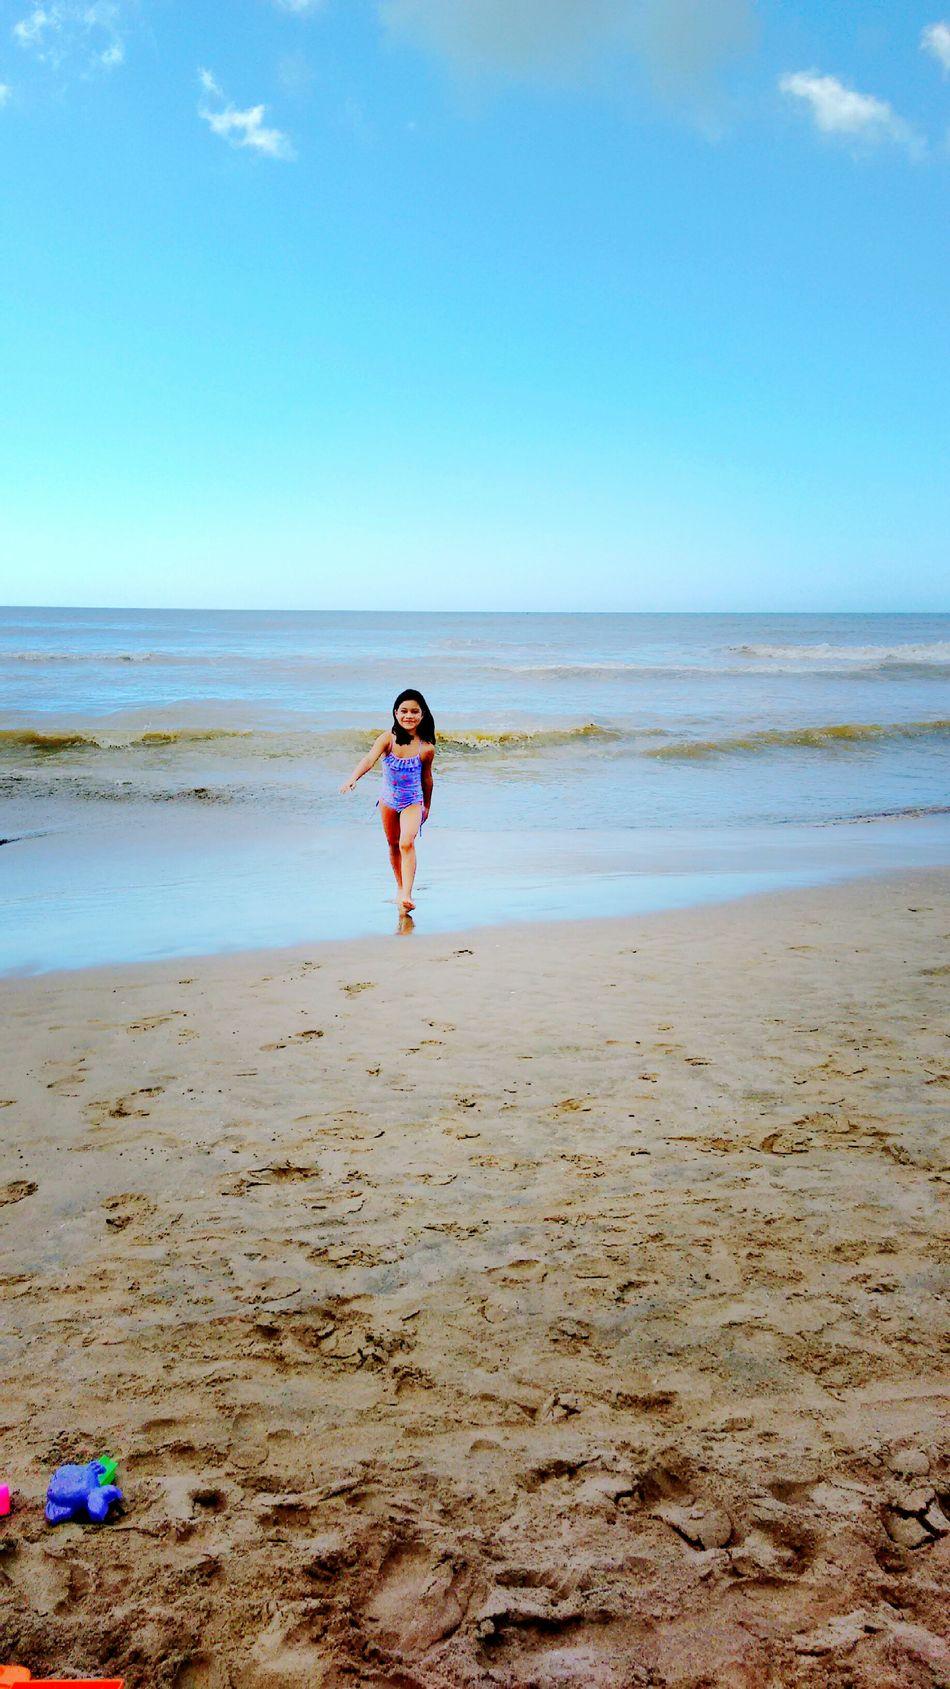 Sun Solyarena Playa #beach Beachphotography Beach Soleesabbia Beach Photography Spiaggia Sole Solyarena Pinamar La Costa Argentina